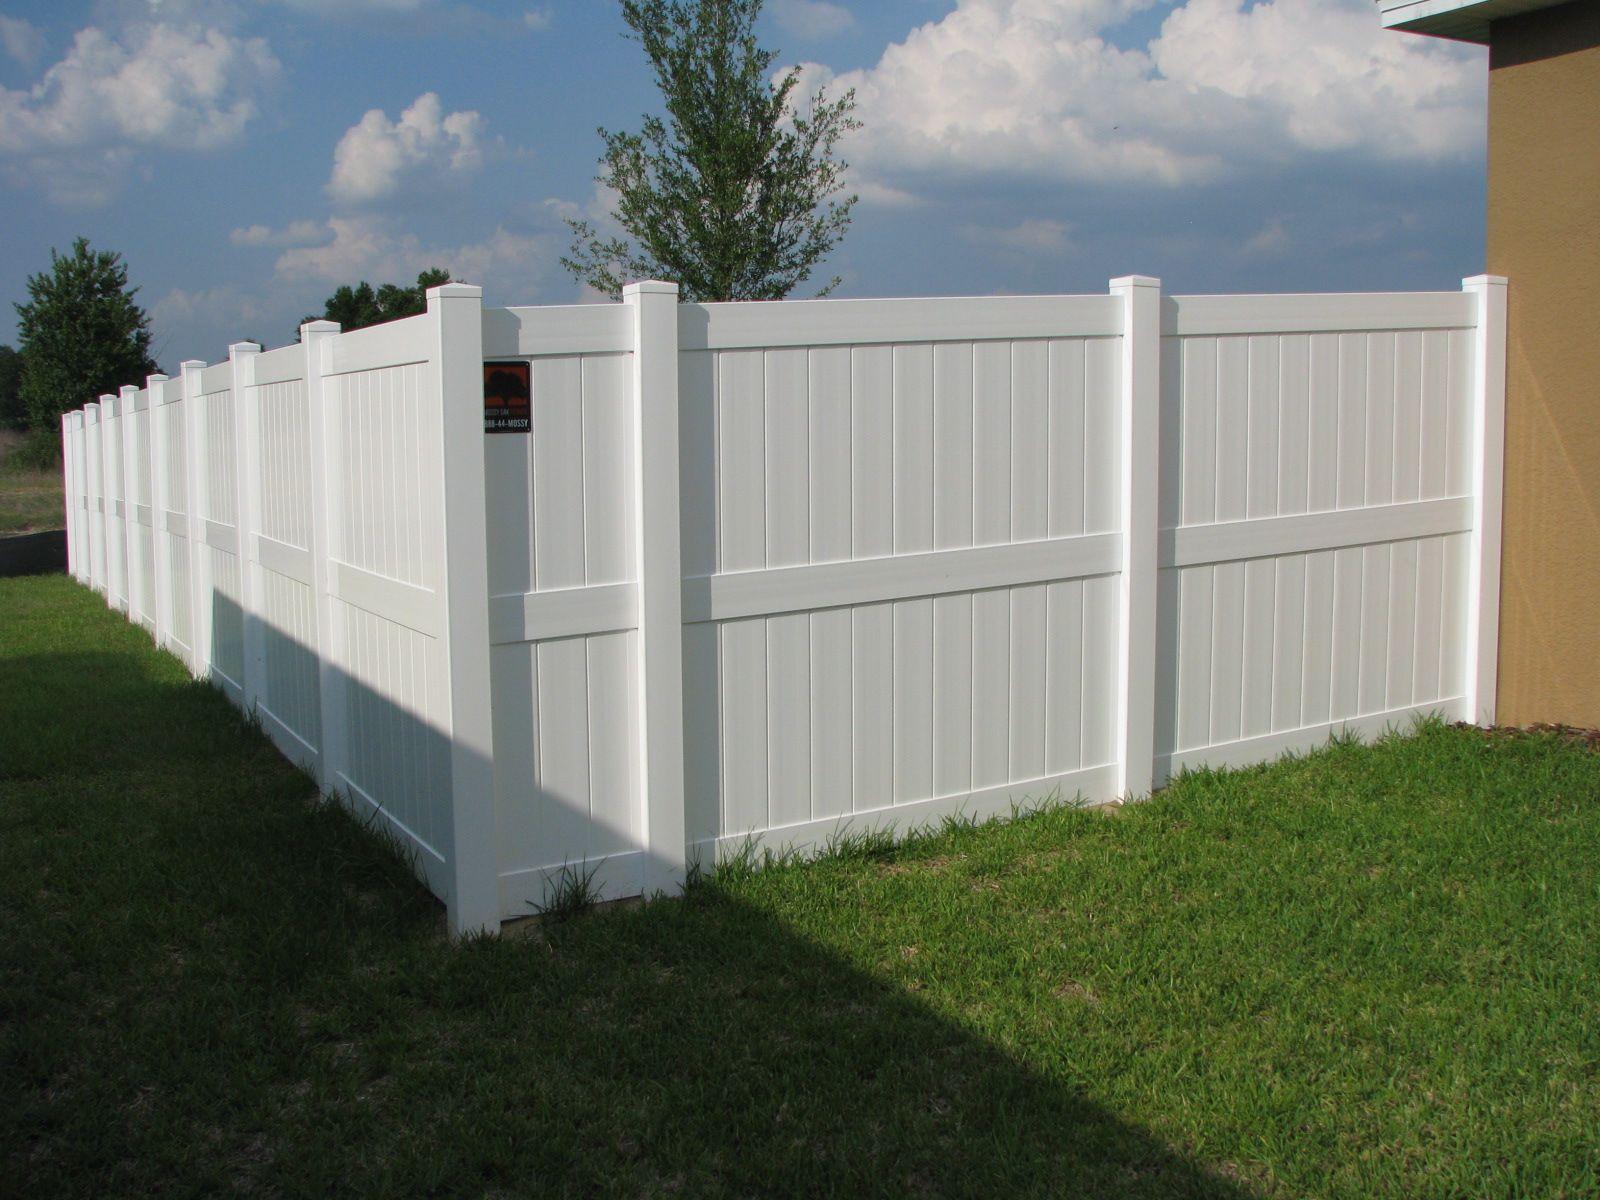 Mossy Oak Fence Vinyl Fence Designs White Vinyl Fence